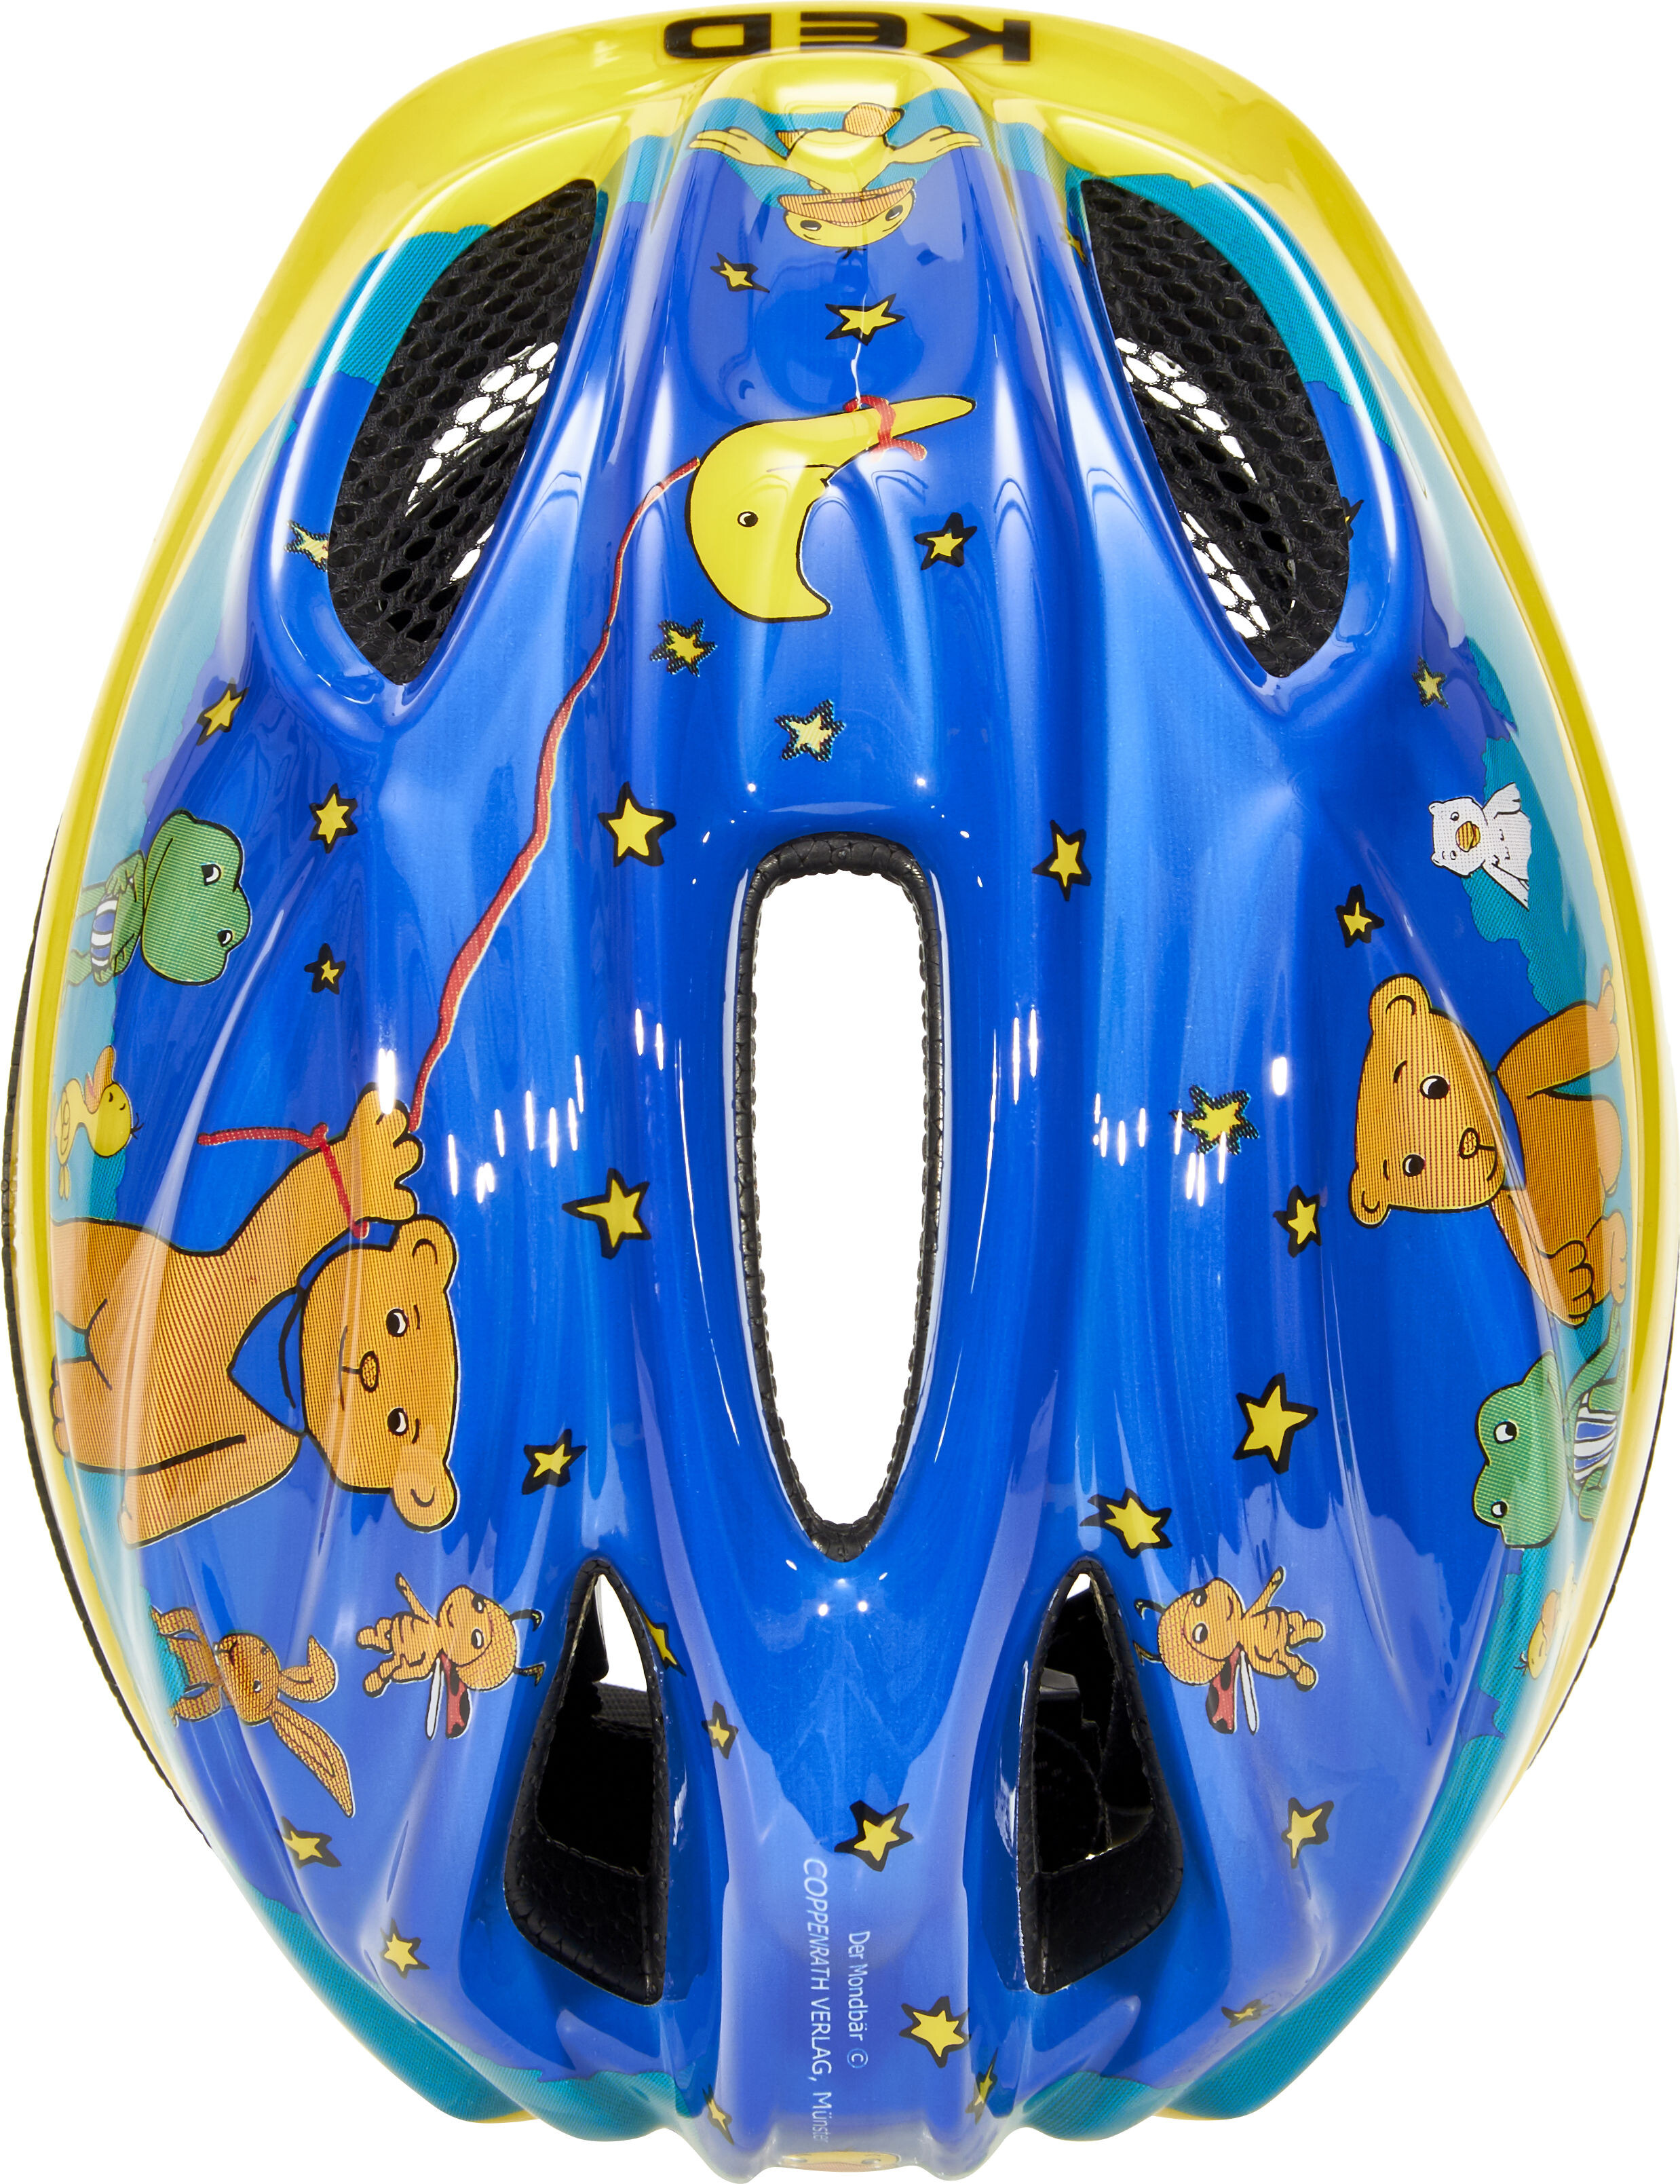 ked meggy ii originals bike helmet children yellow. Black Bedroom Furniture Sets. Home Design Ideas